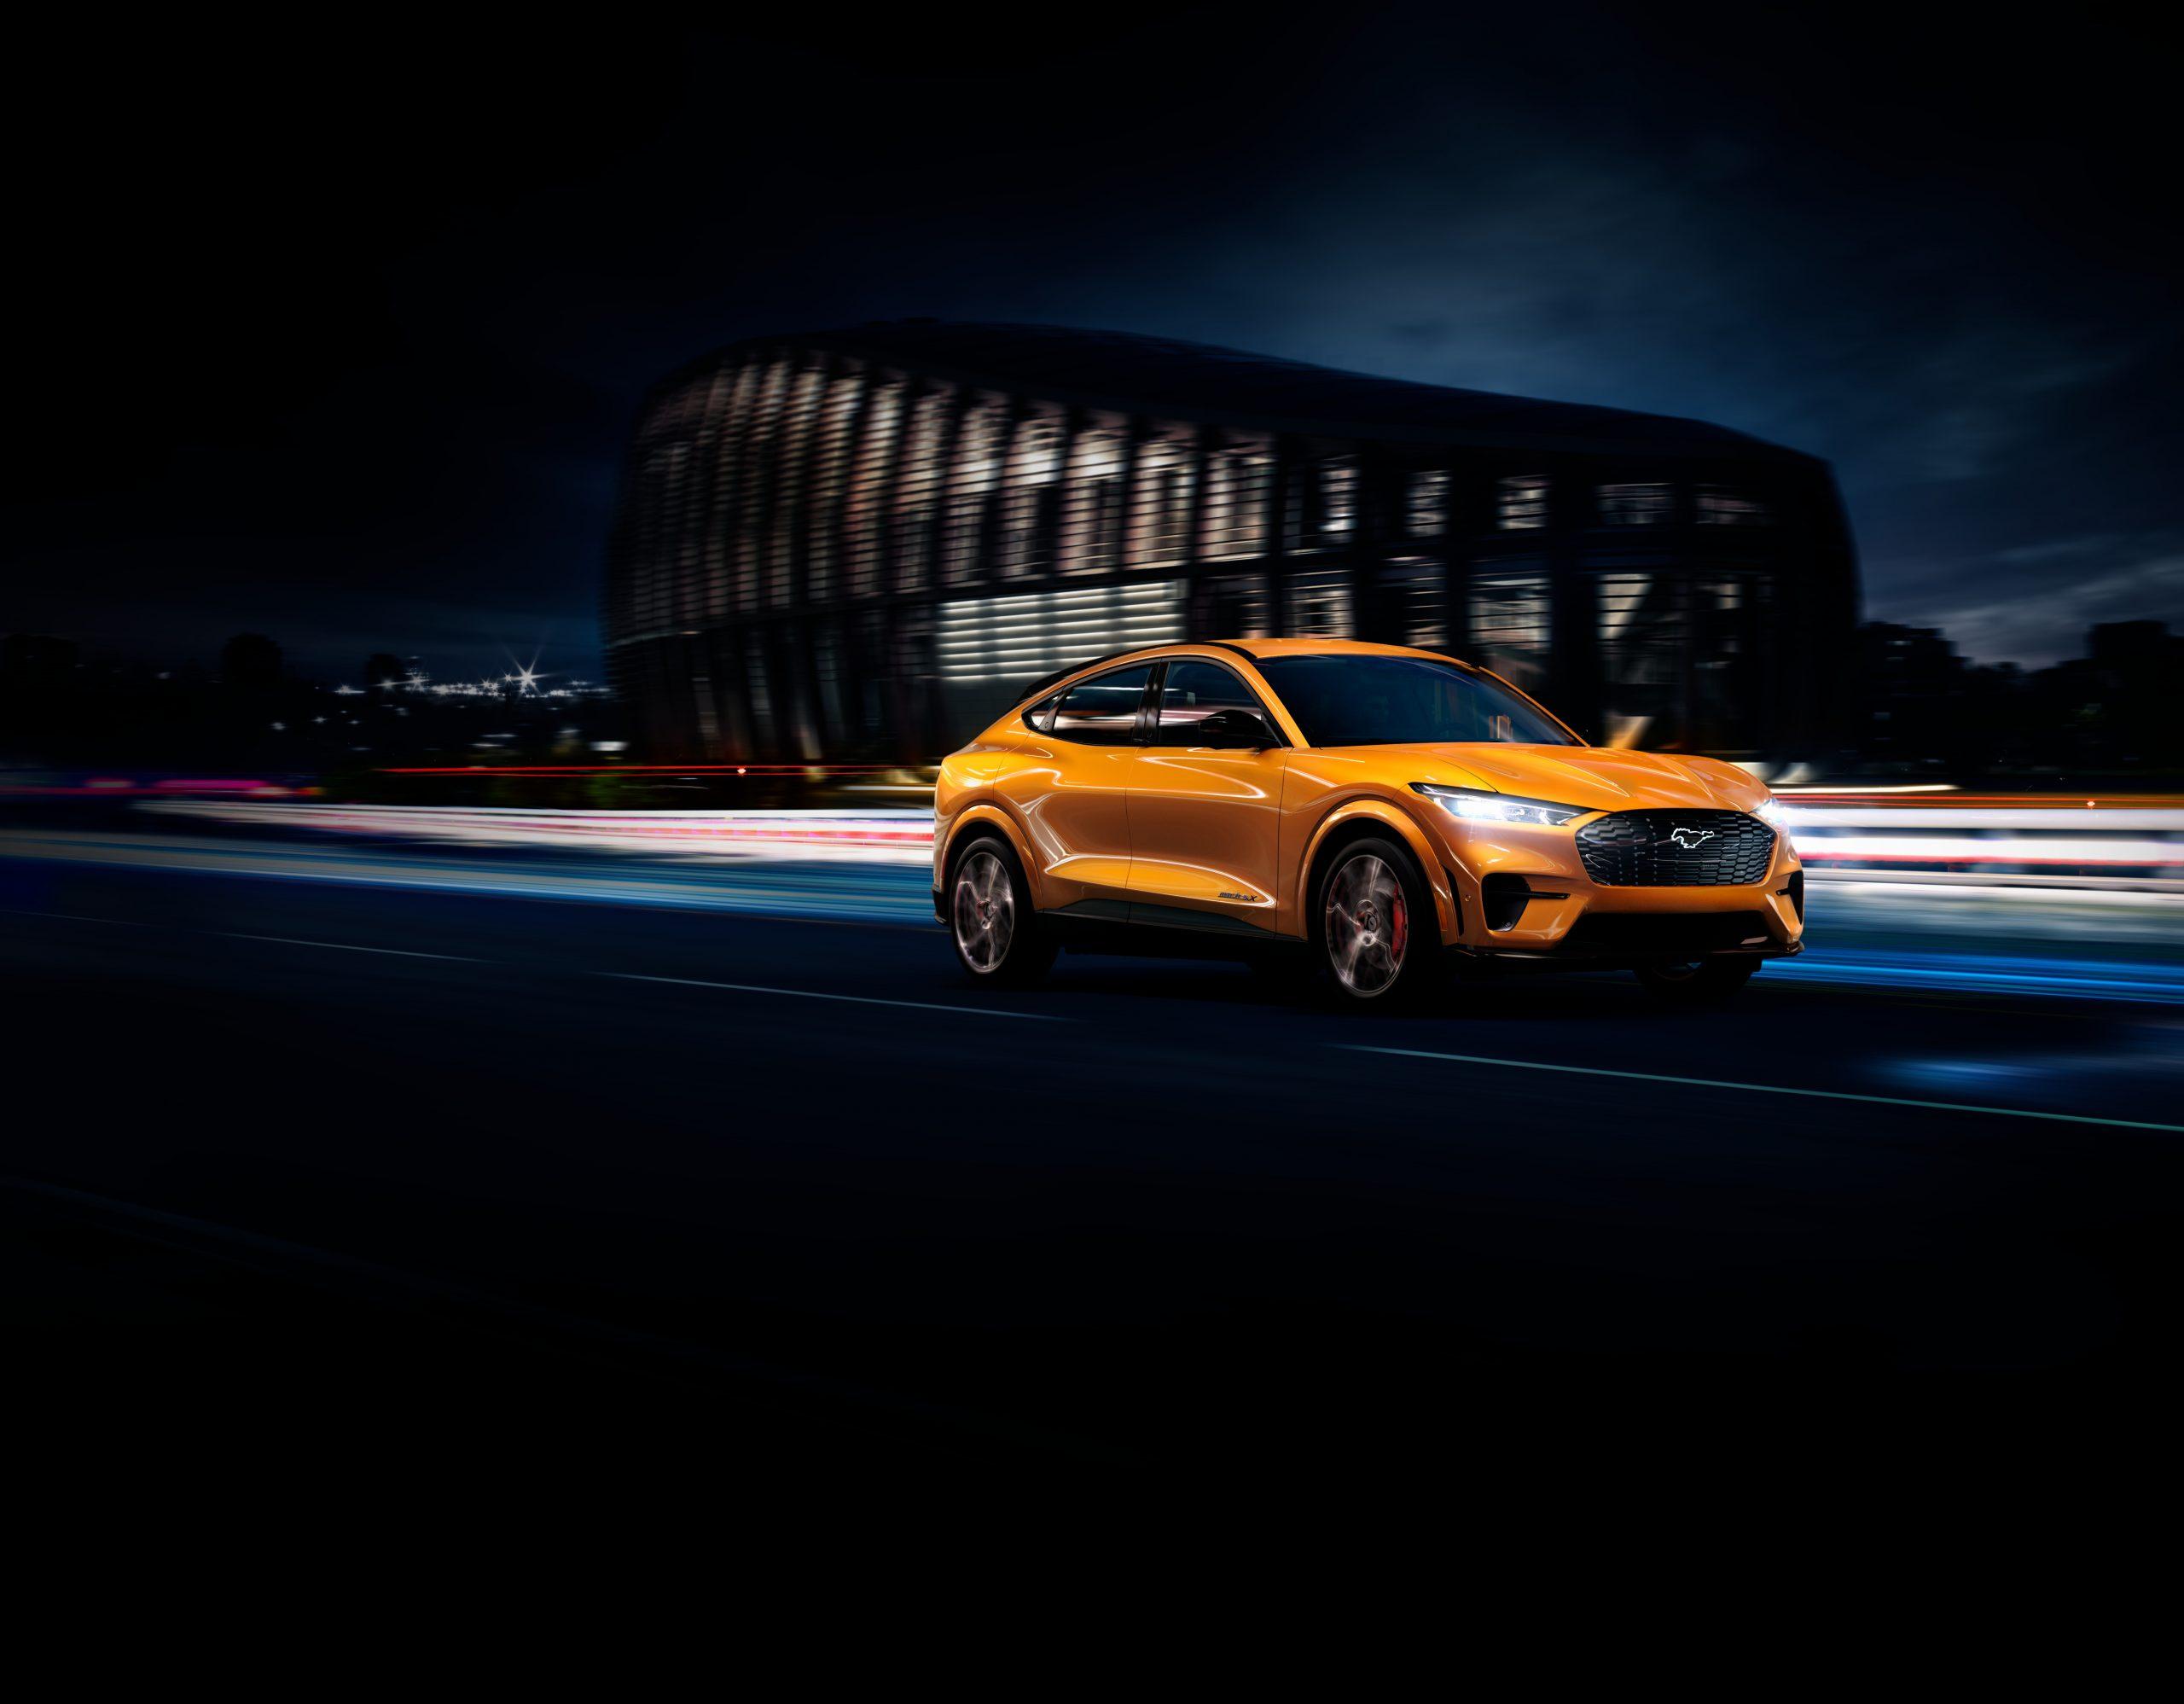 2020 FORD MACH E GT CYBER ORANGE 01 scaled Από 51.587 ευρώ η τιμή της Ford Mustang Mach-E στην Ελλάδα Electric cars, electric vehicles, EV, Ford, Ford Mustang, Ford Mustang Mach-E, zblog, ειδήσεις, ηλεκτρικά, ηλεκτροκινηση, κινουμαι ηλεκτρικα, Νέα